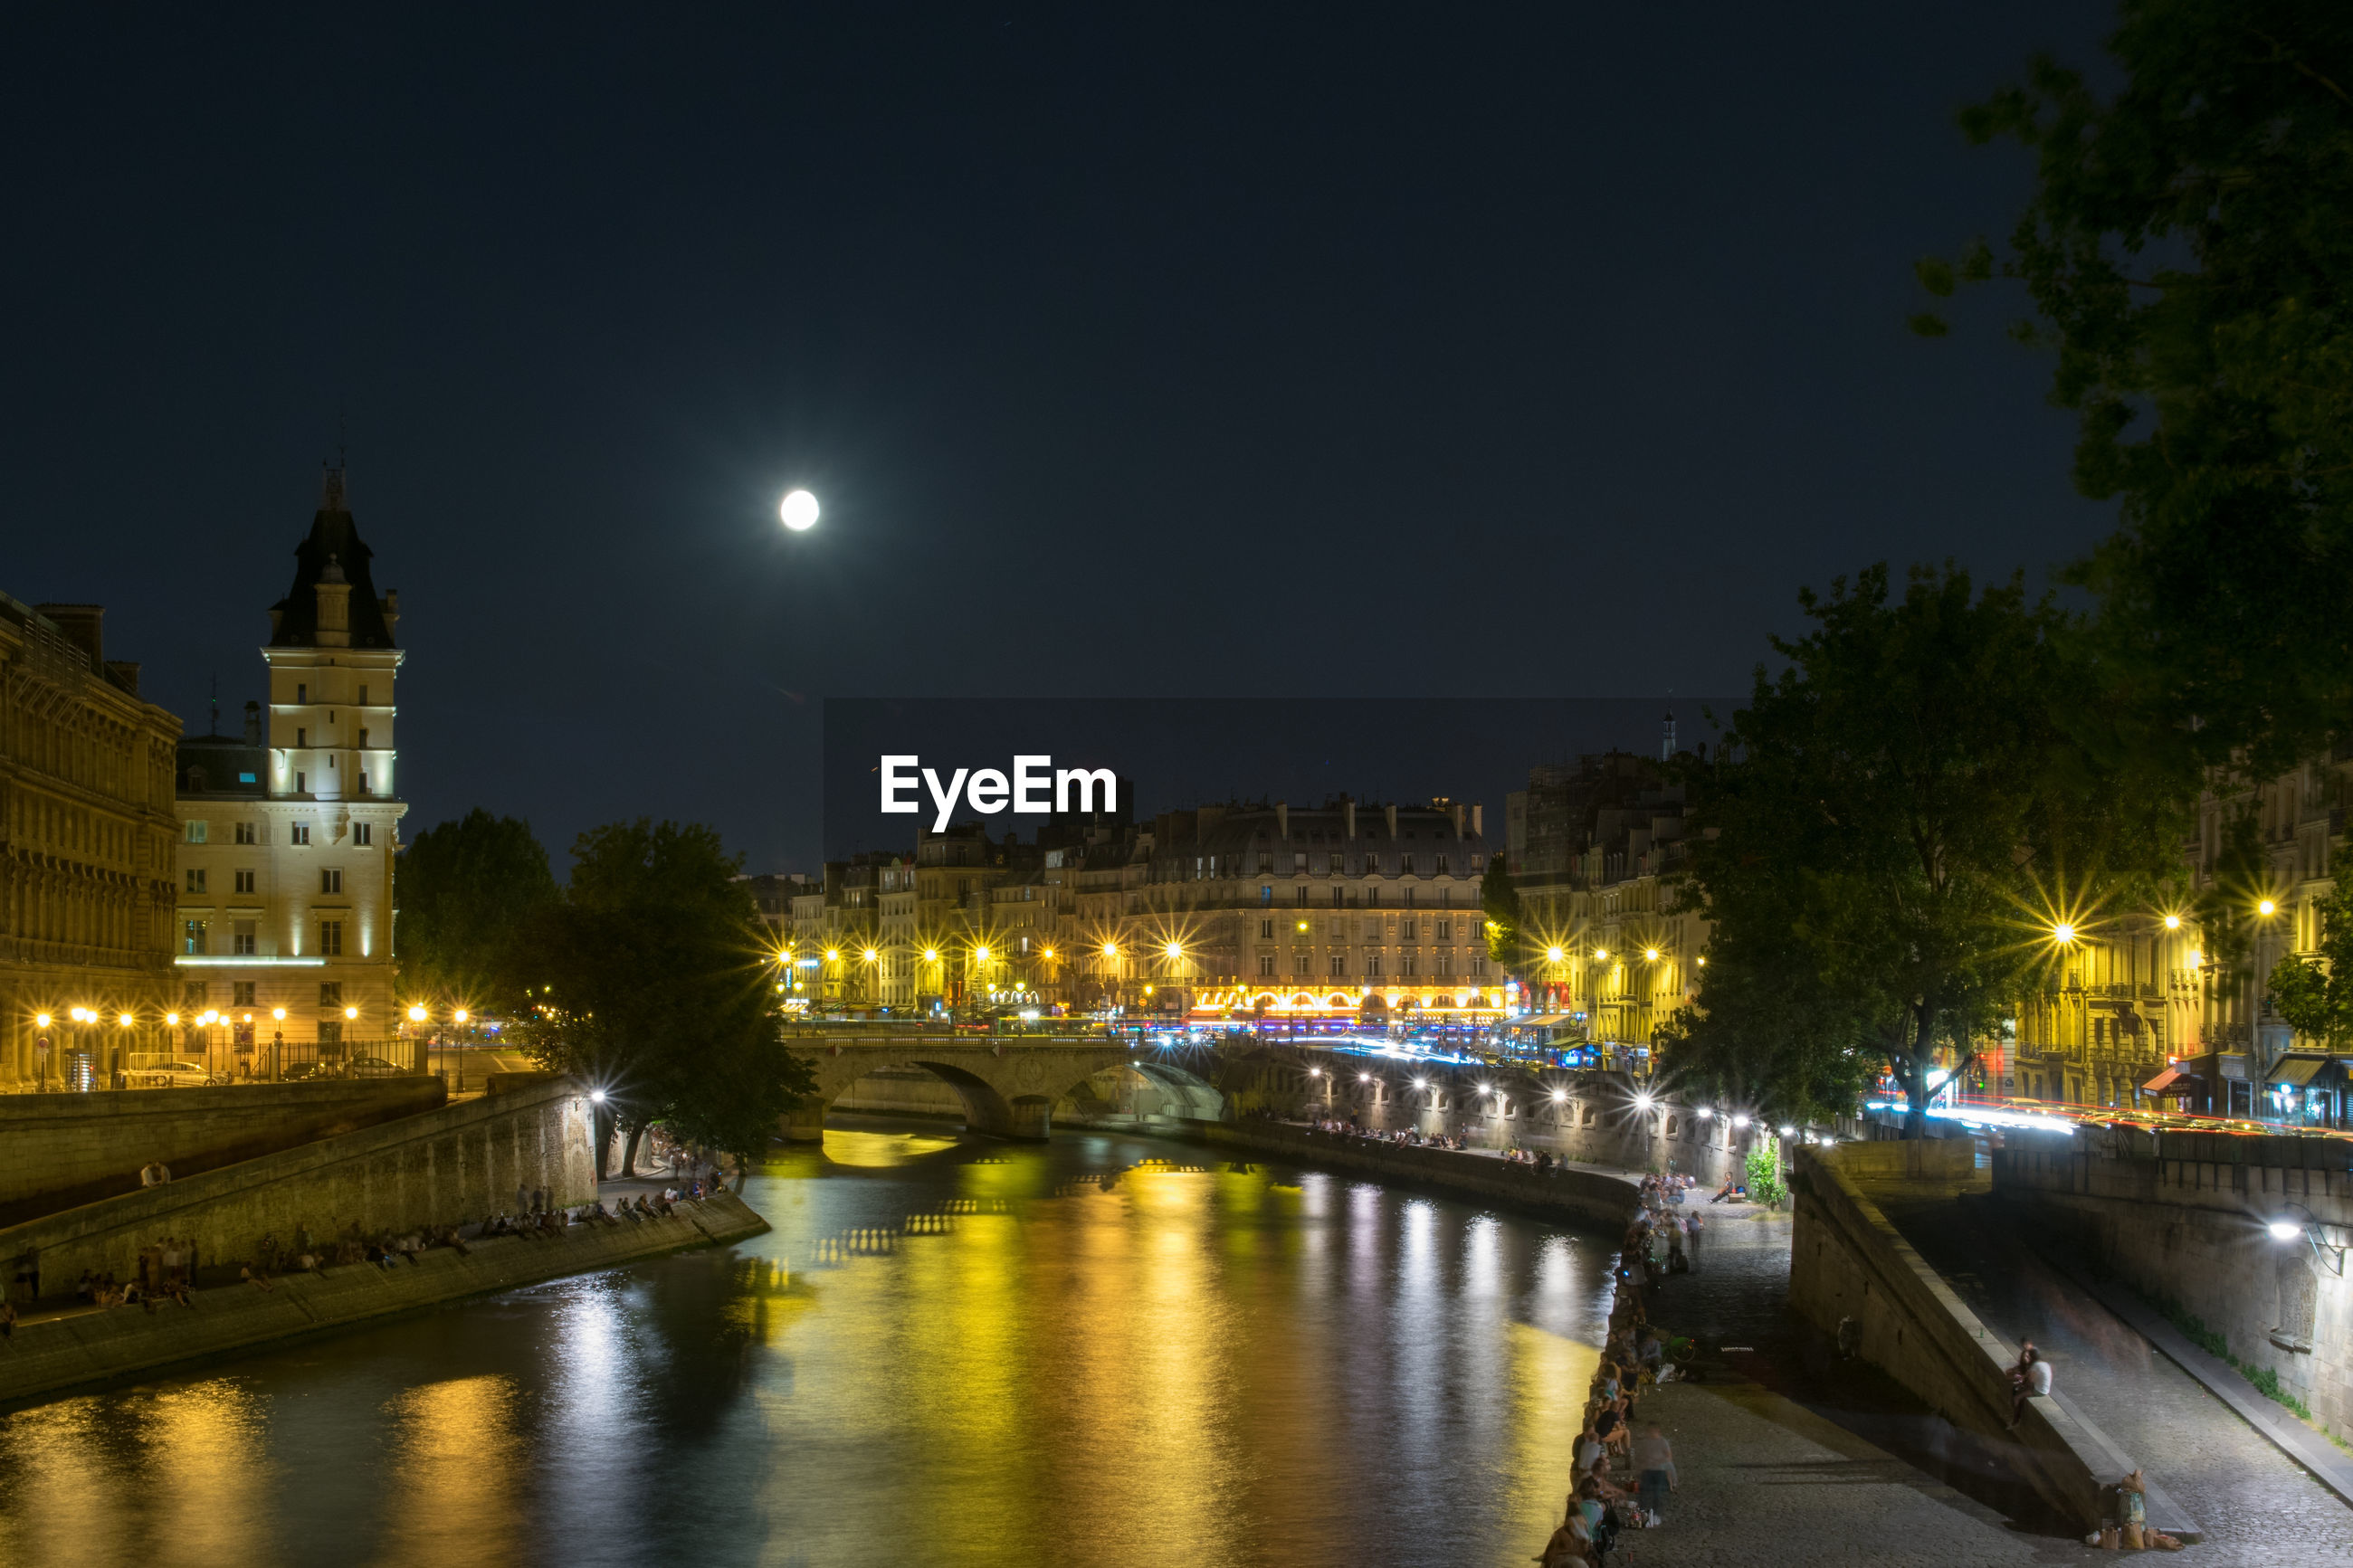 ILLUMINATED BRIDGE OVER RIVER AGAINST BUILDINGS IN CITY AT NIGHT